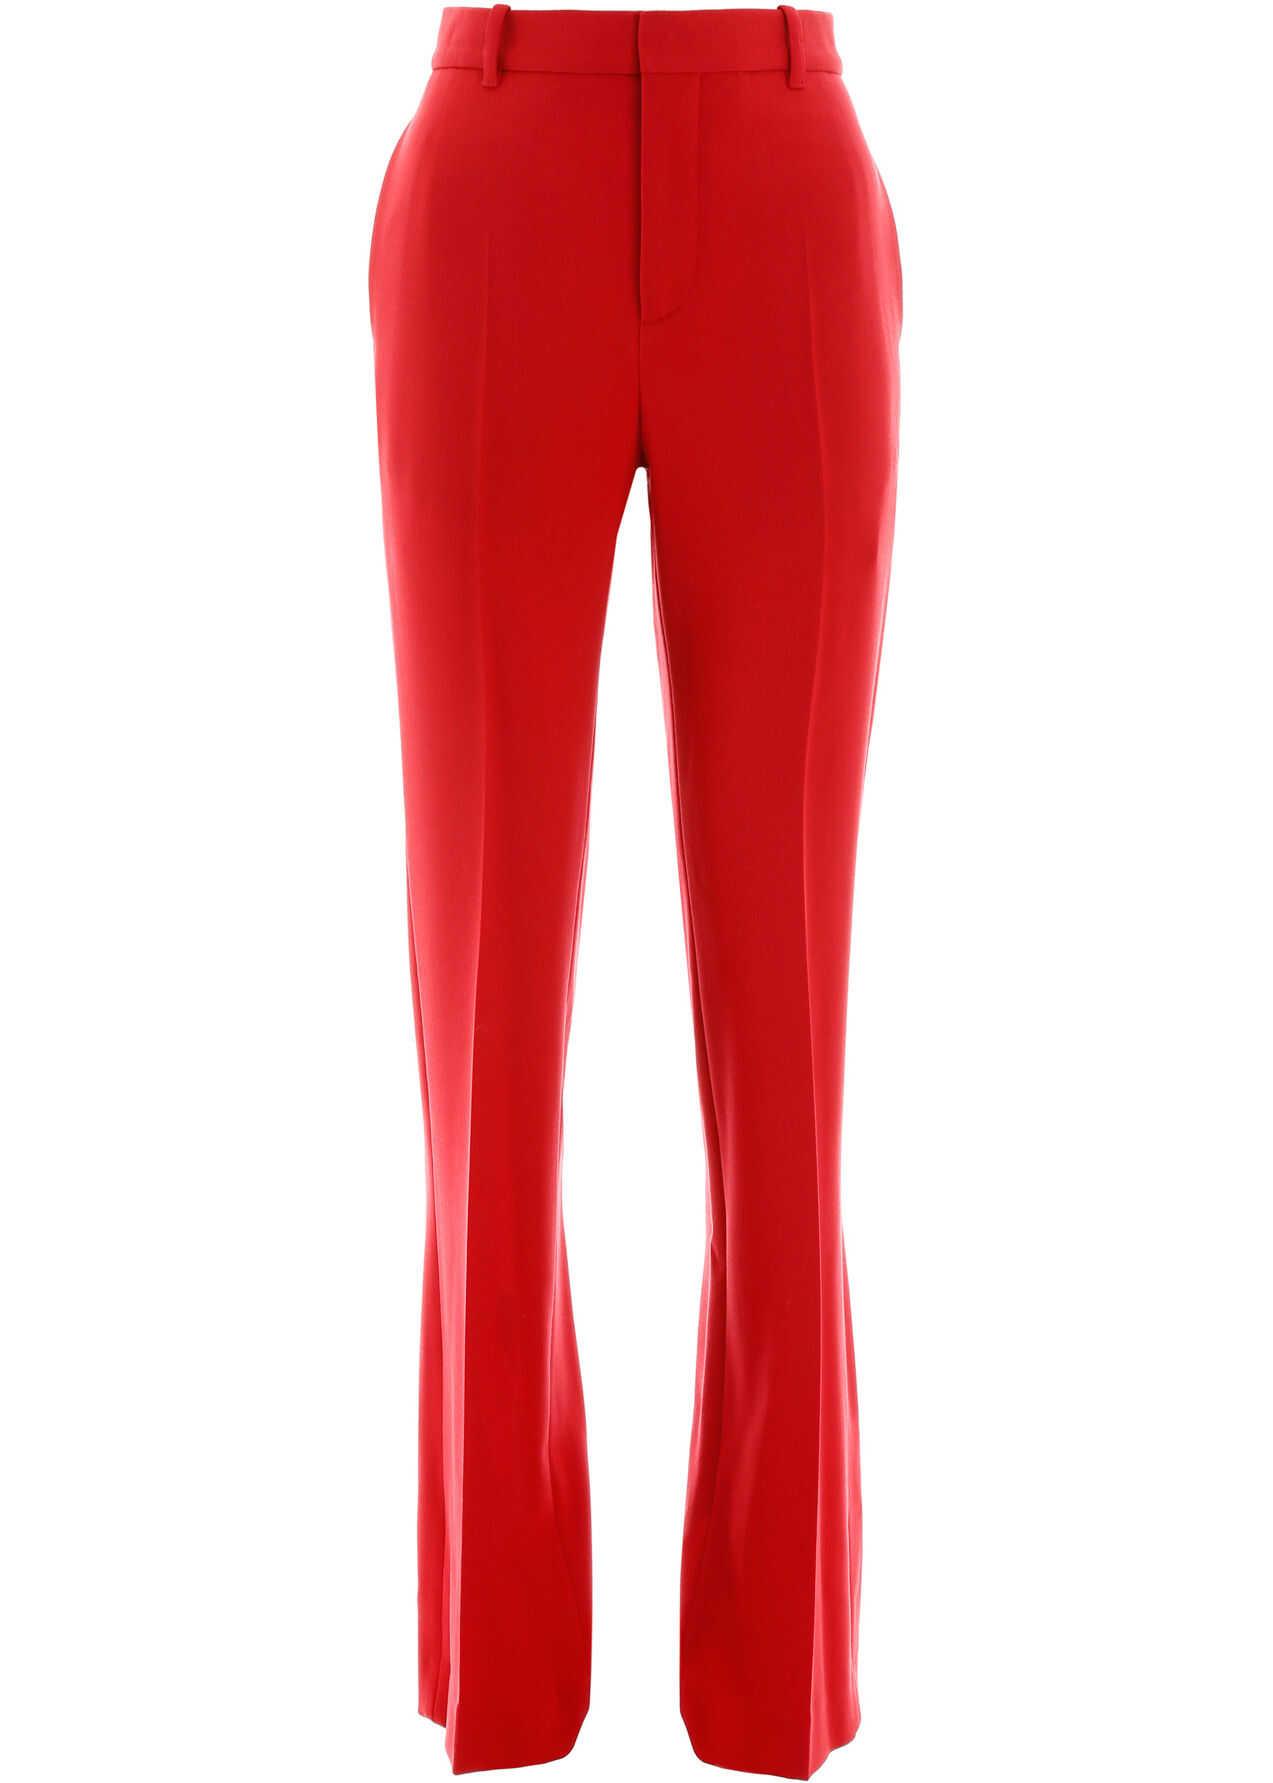 Balenciaga Tailoring Trousers MASAI RED